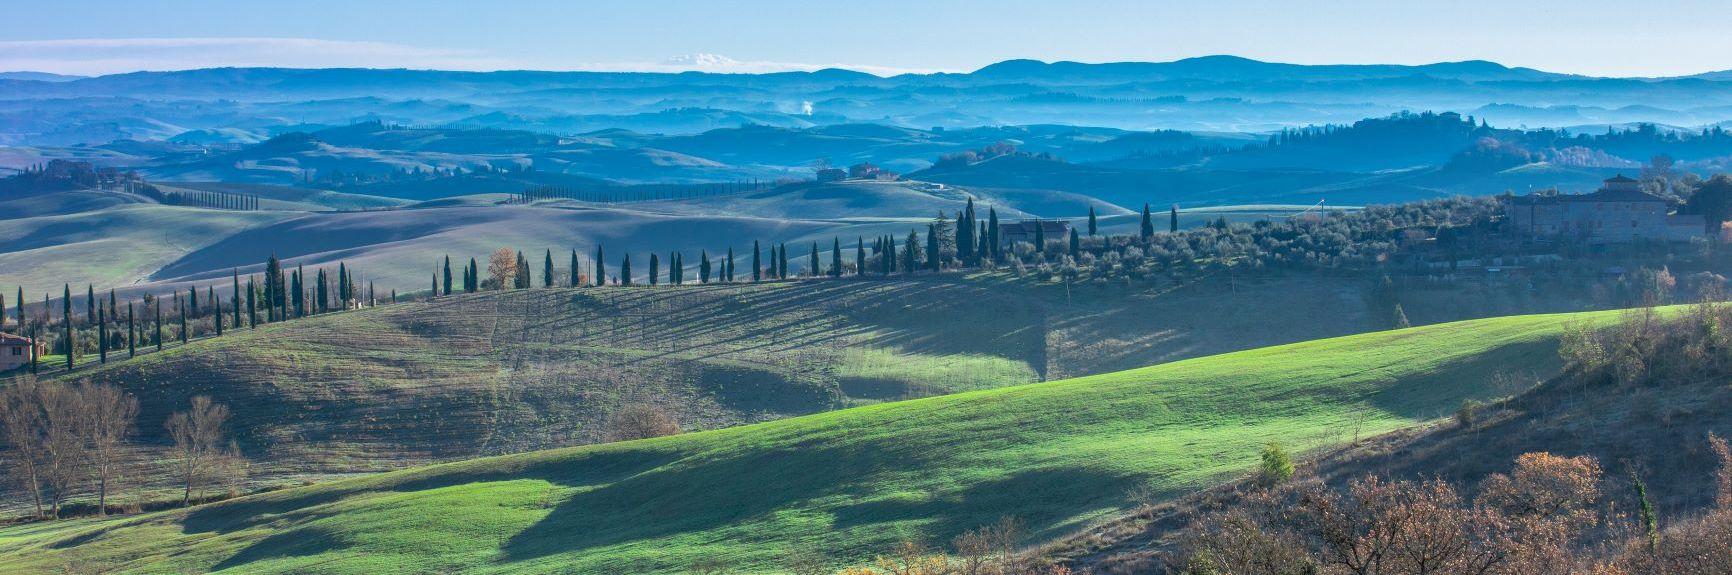 Area Produttiva Isola D'arbia, Toscana, Itália